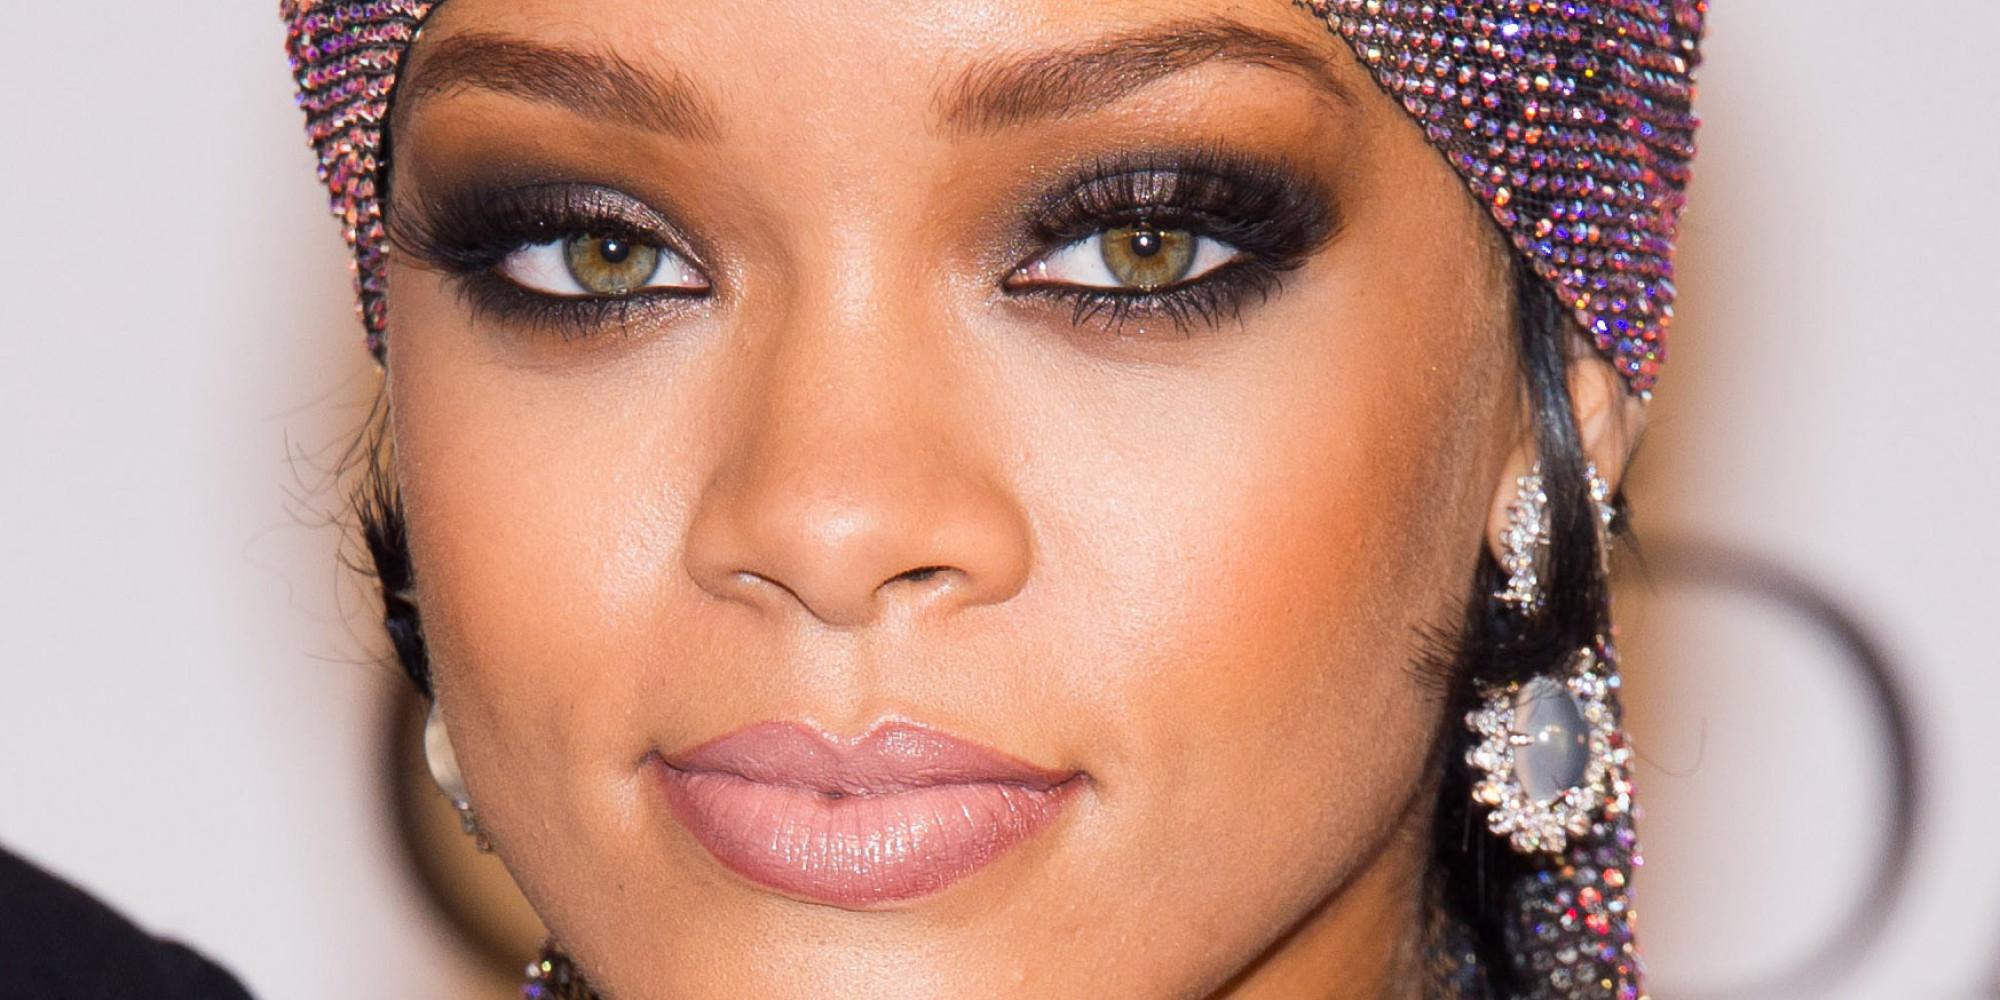 Best Rihanna Looks - Outfit Ideas HQ